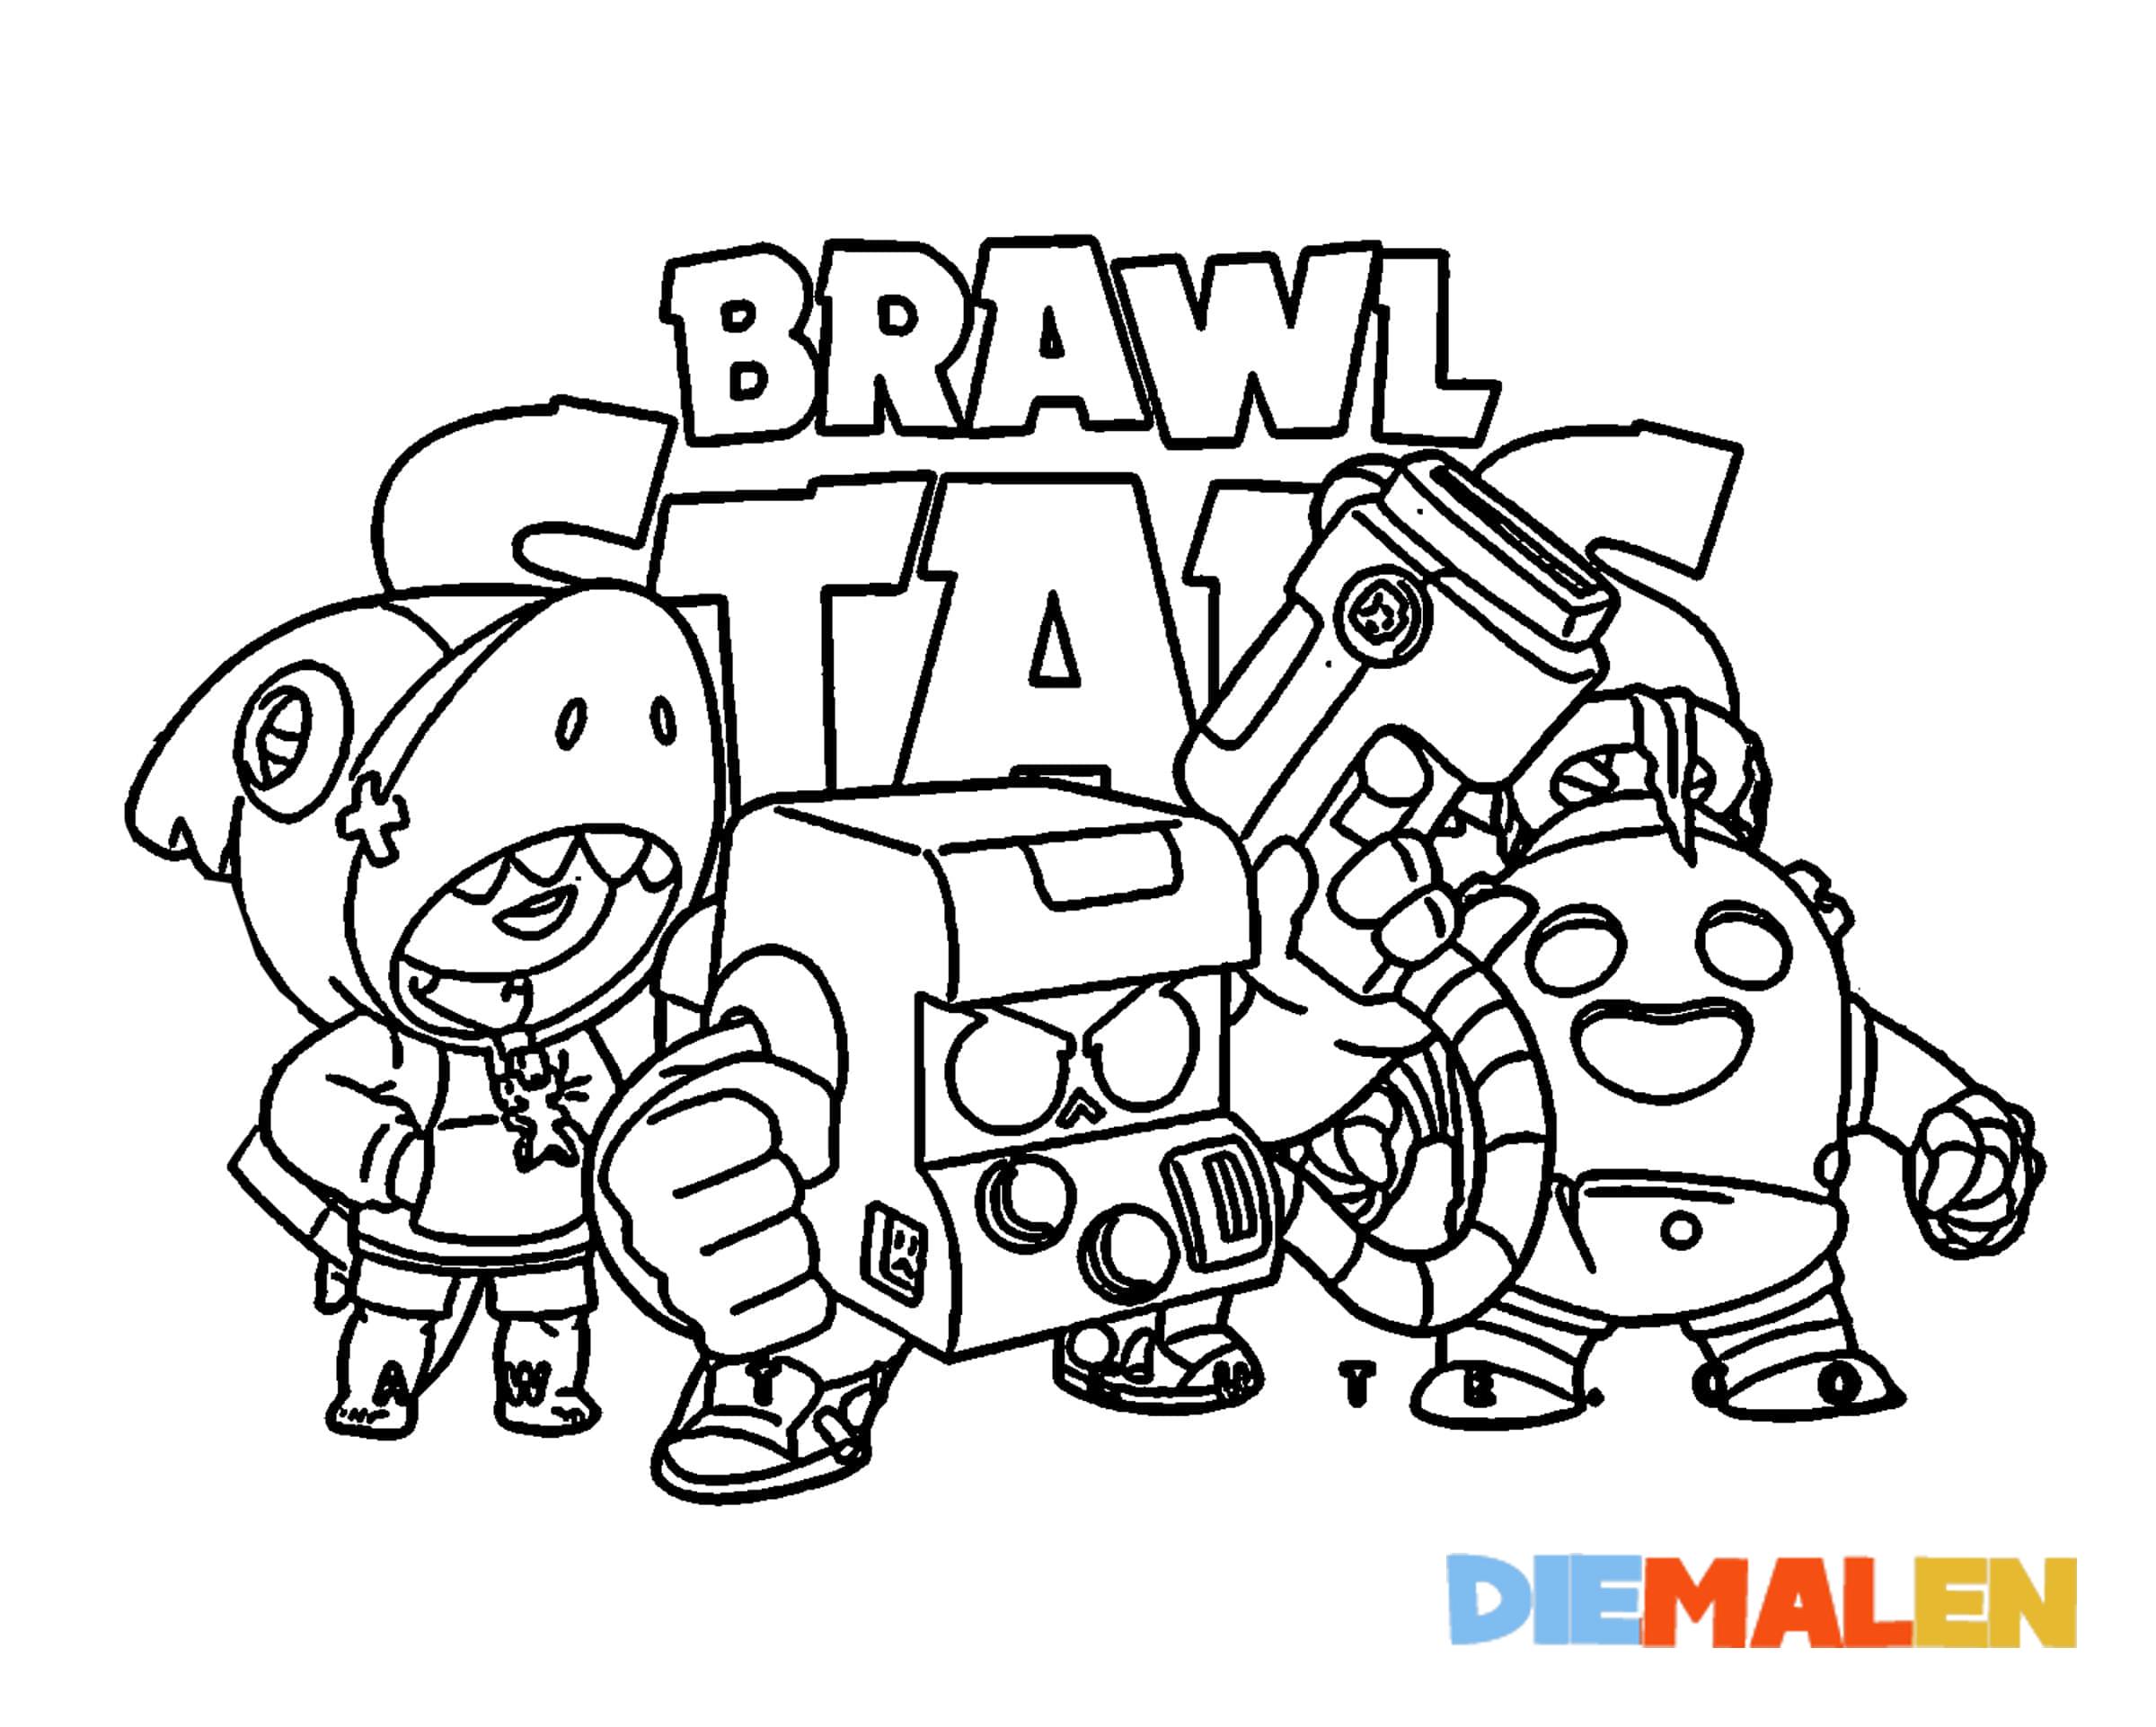 Brawl Stars Ausmalbilder → DieMalen.com